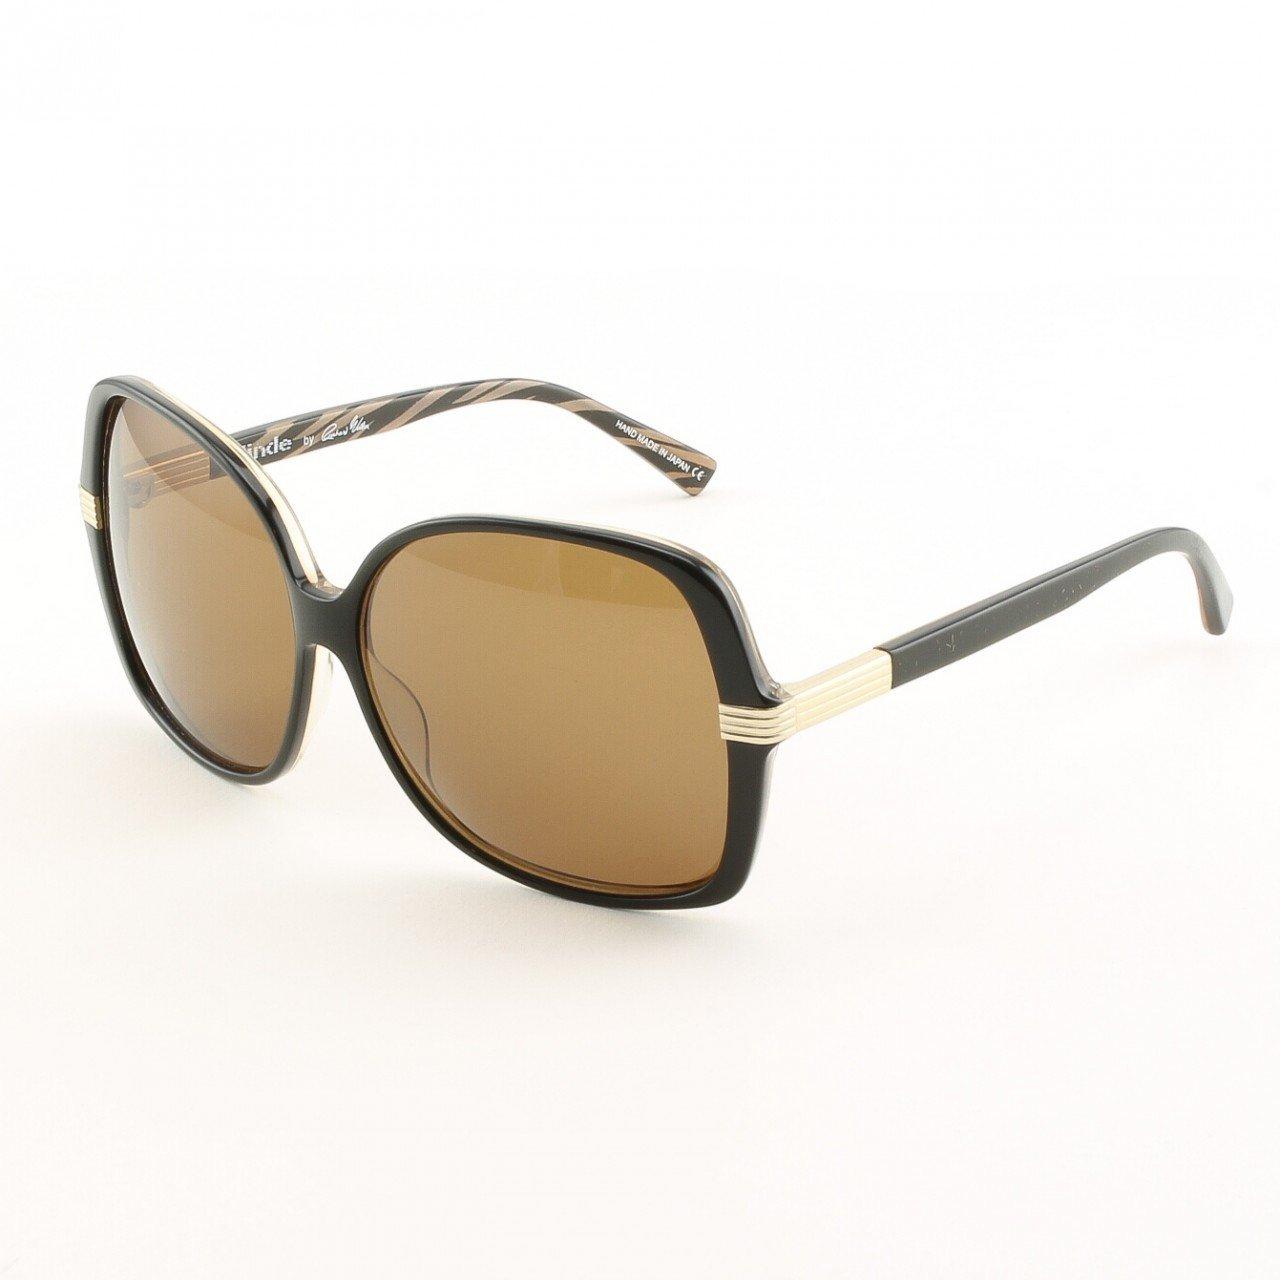 Blinde Swing Set Women's Sunglasses Col. Brown Zebra with Brown Lenses